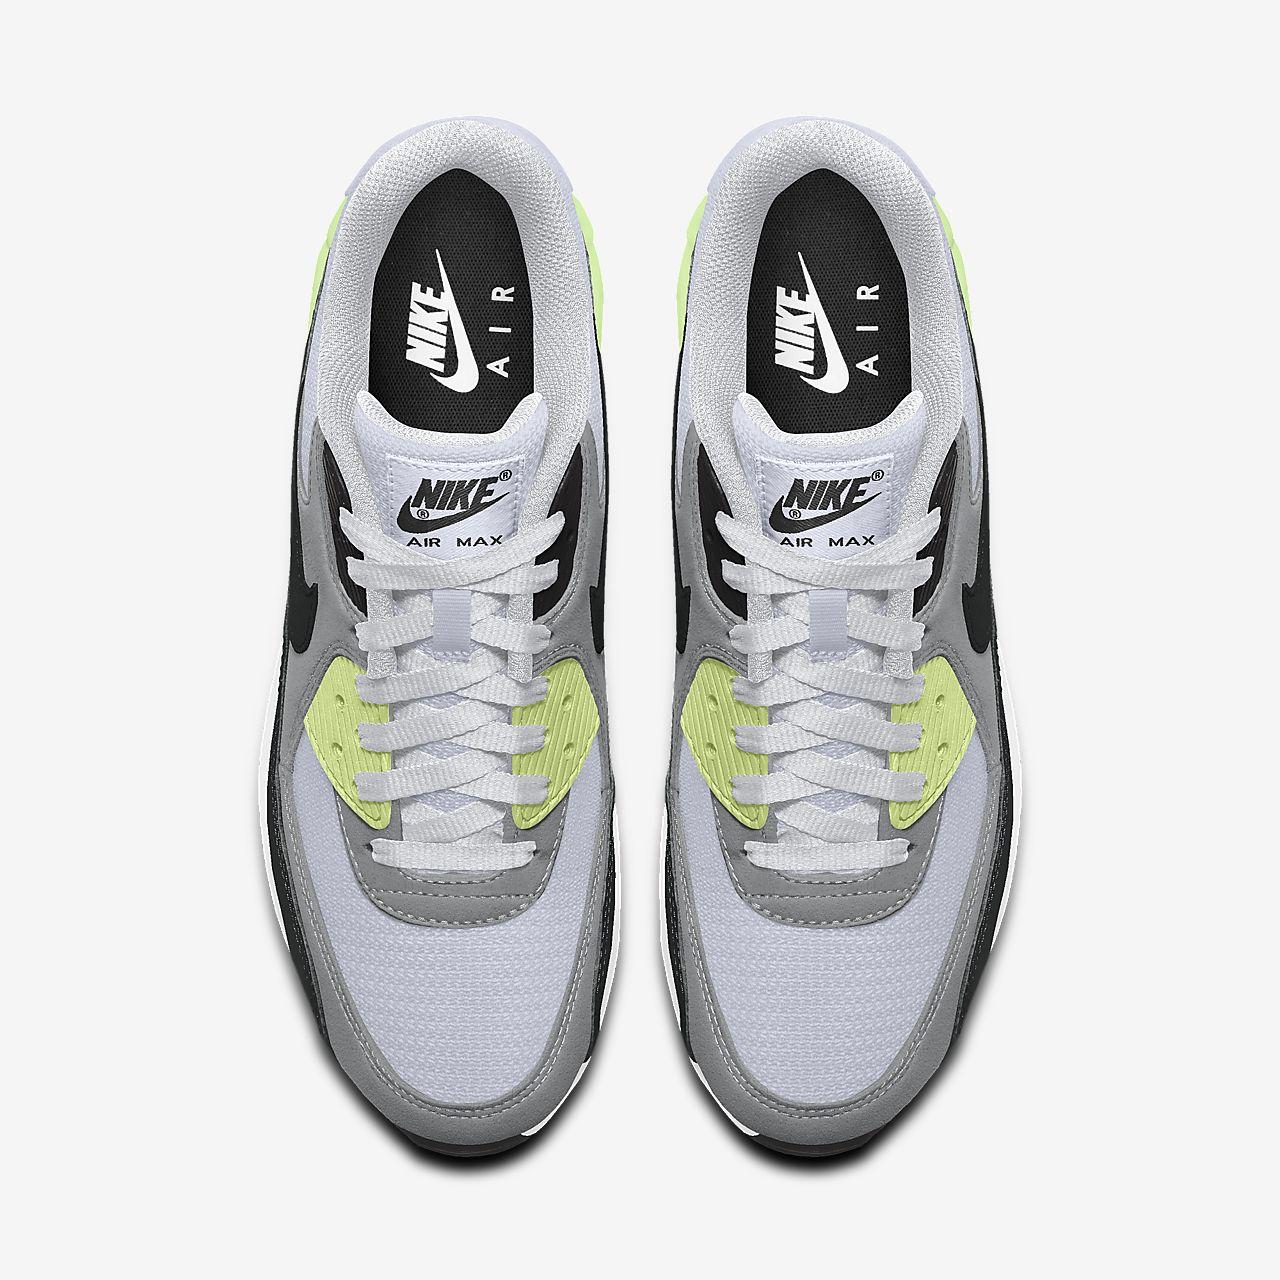 Nike Air Max 90 By You personalisierbarer Damenschuh